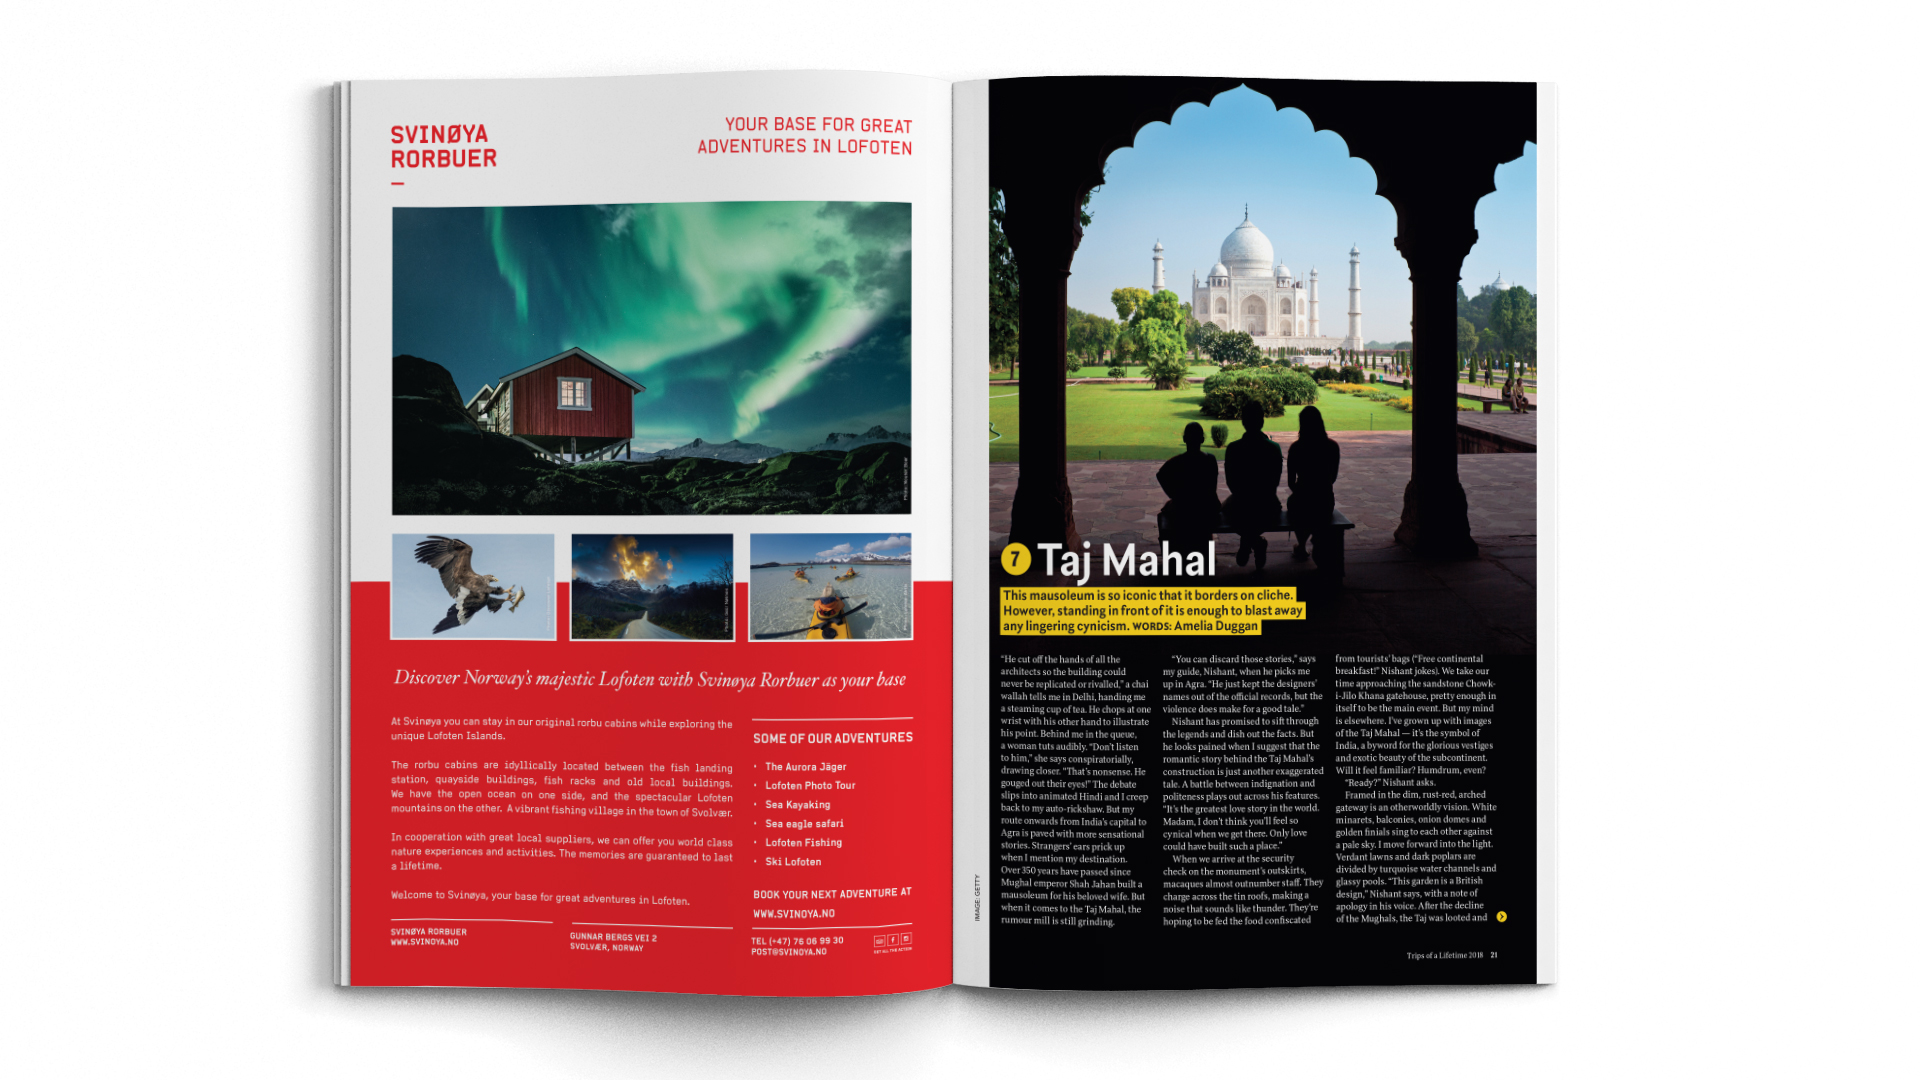 A4-Magazine-DPS-NGT-TRIPS-Taj-Mahal-1